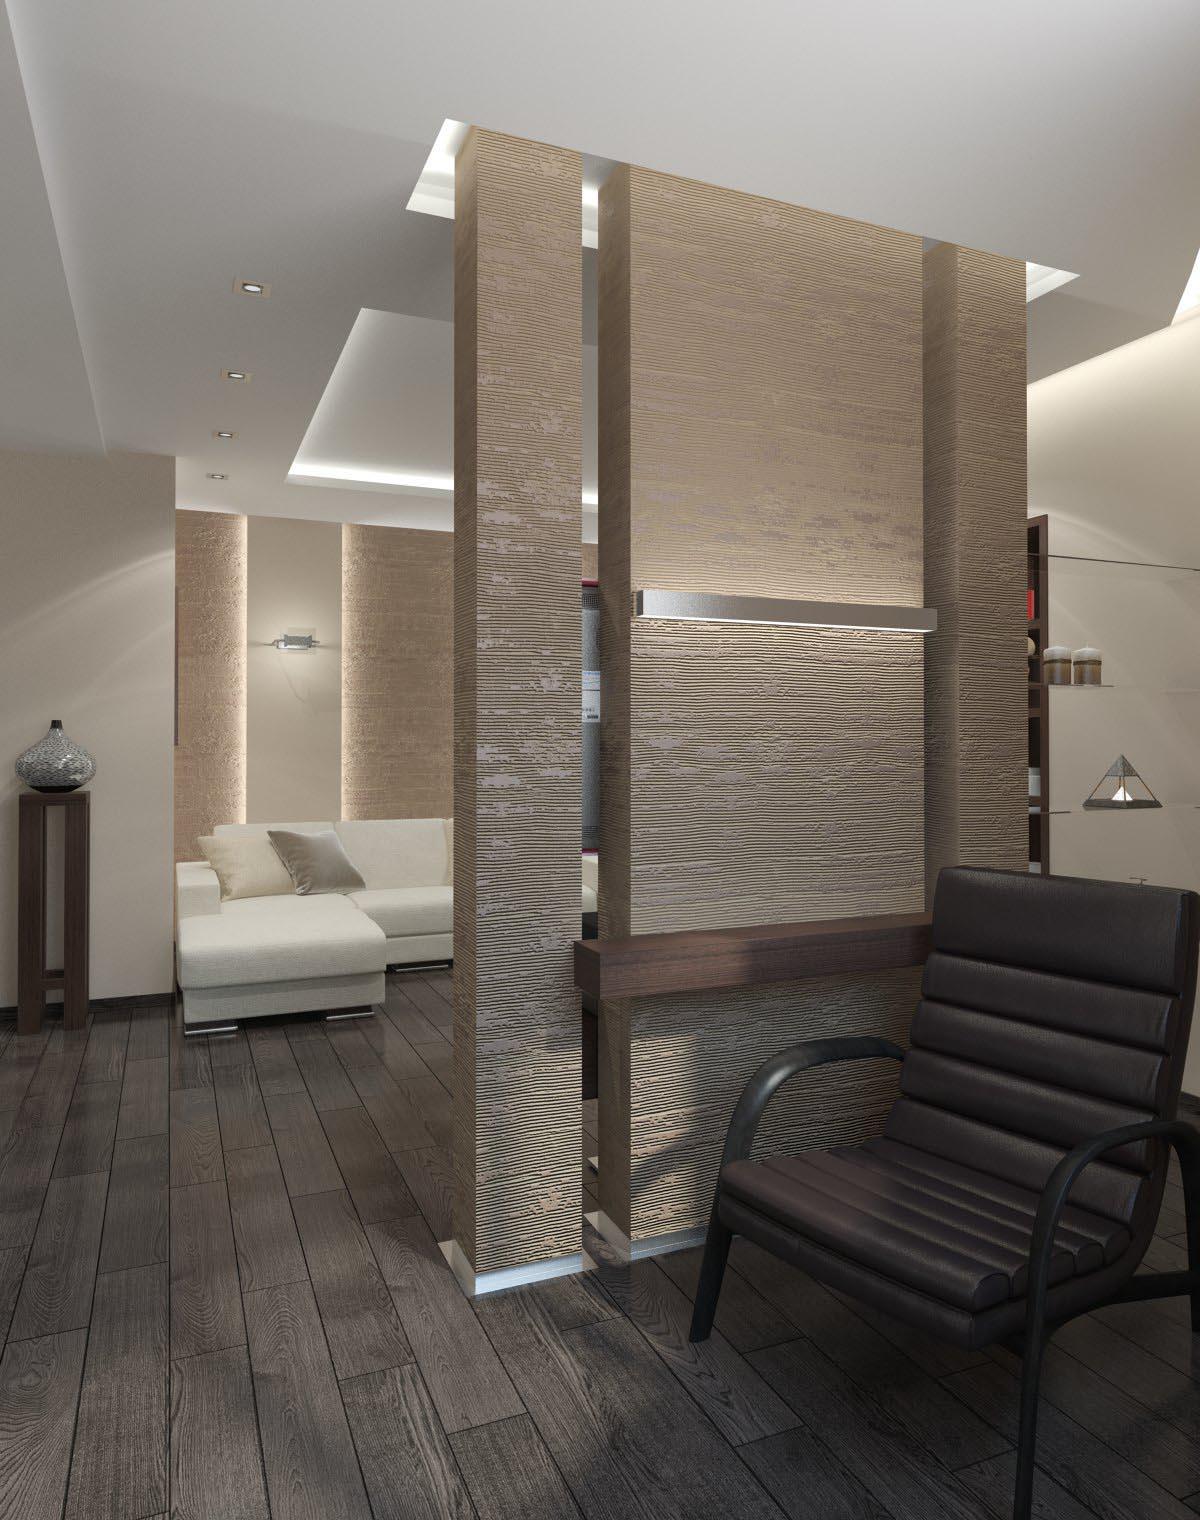 Ремонт однокомнатной квартиры 47 м²